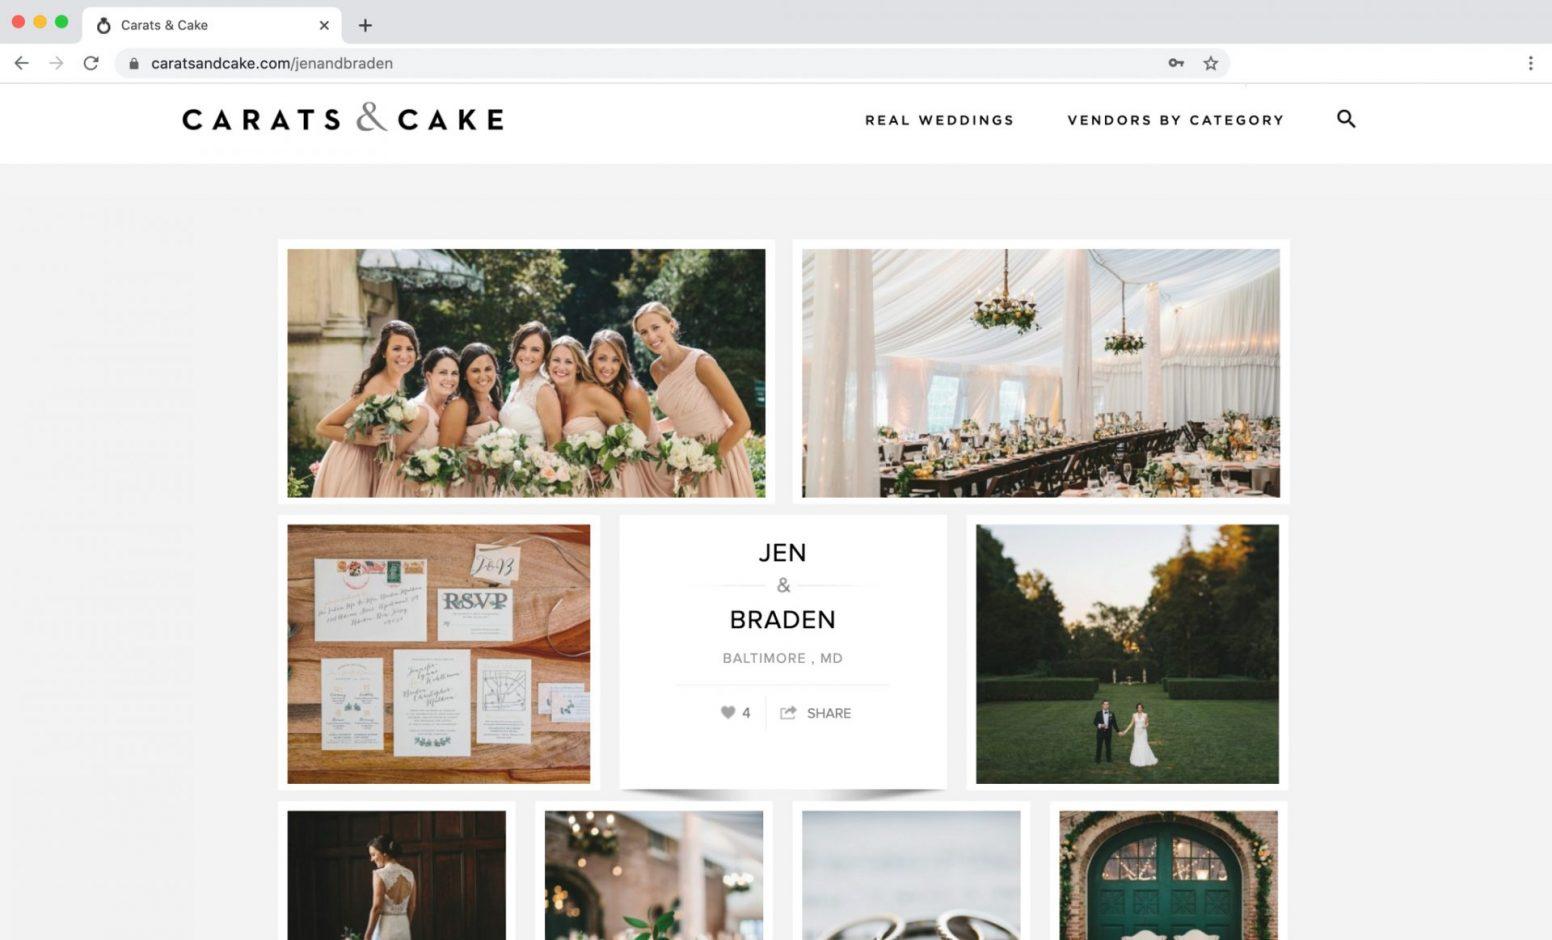 Carats & Cake Feature Evergreen Museum Wedding